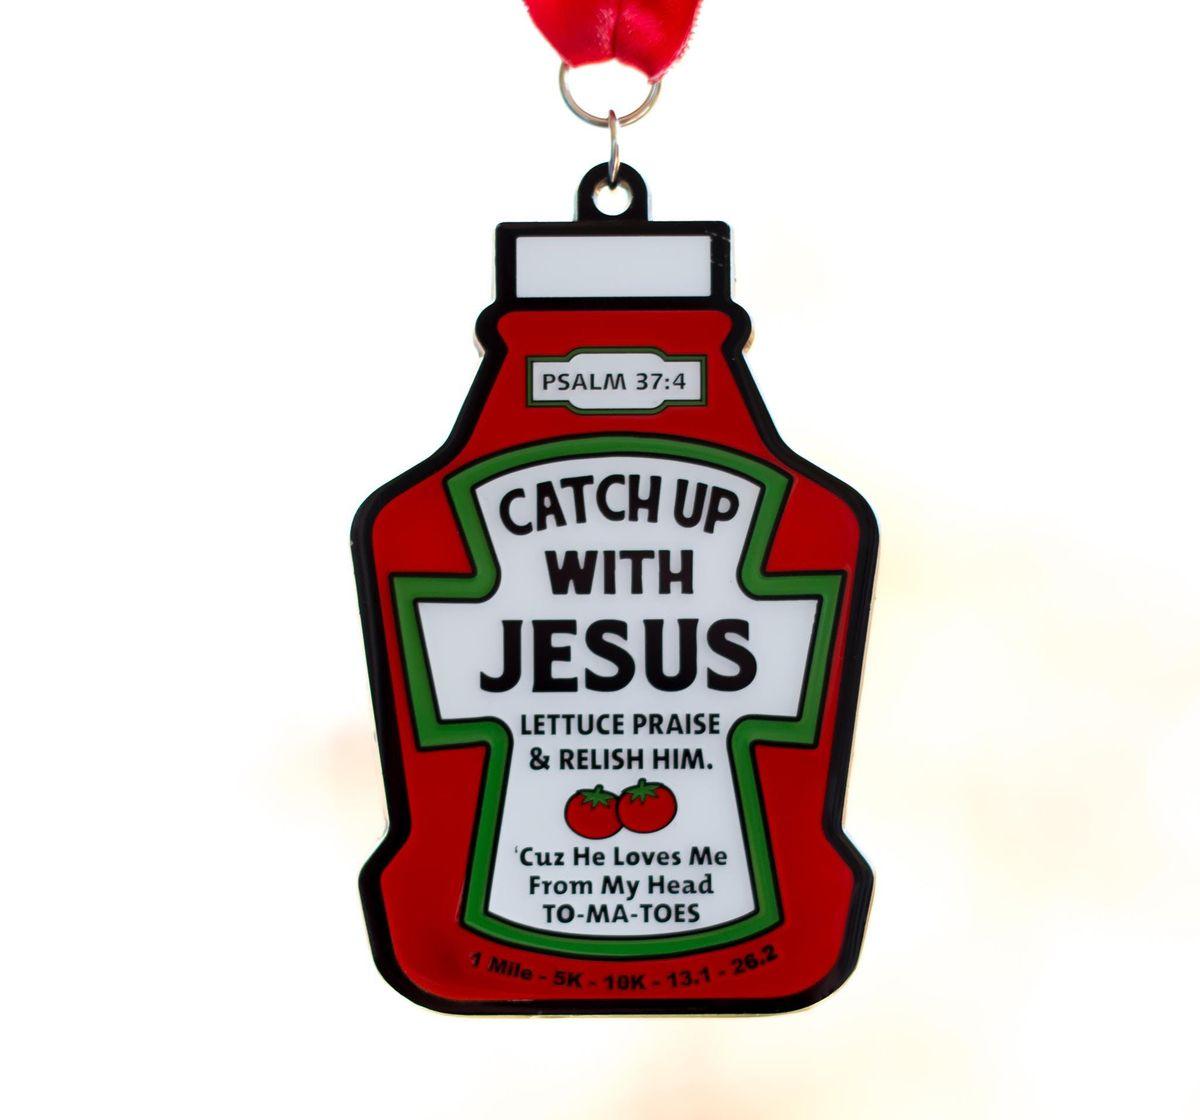 2019 Catch Up With Jesus 1 Mile 5K 10K 13.1 26.2 - Coeur d Alene